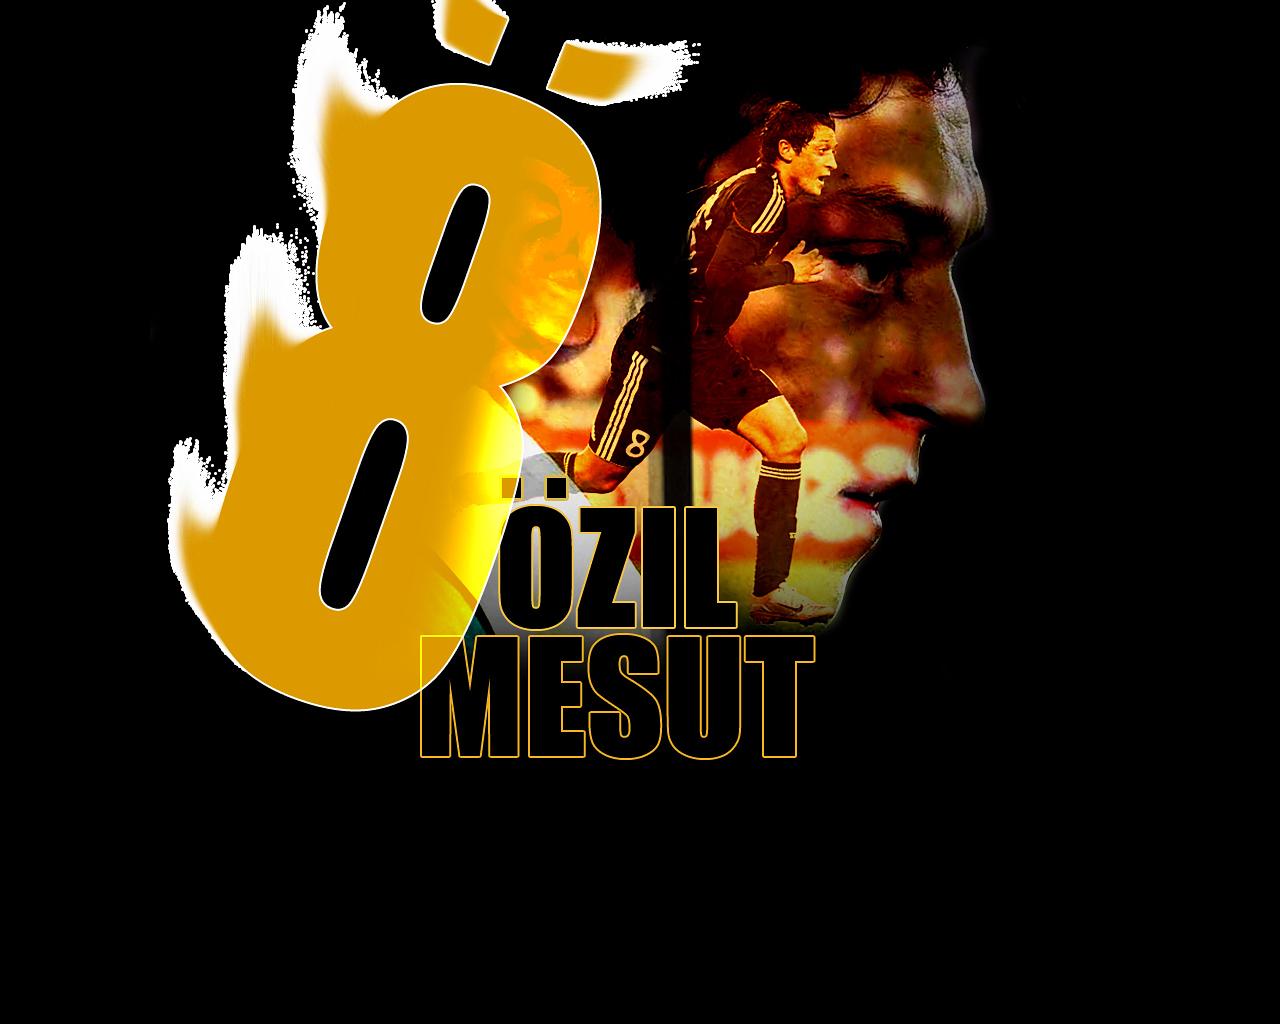 Wallpaper Mesut Ozil